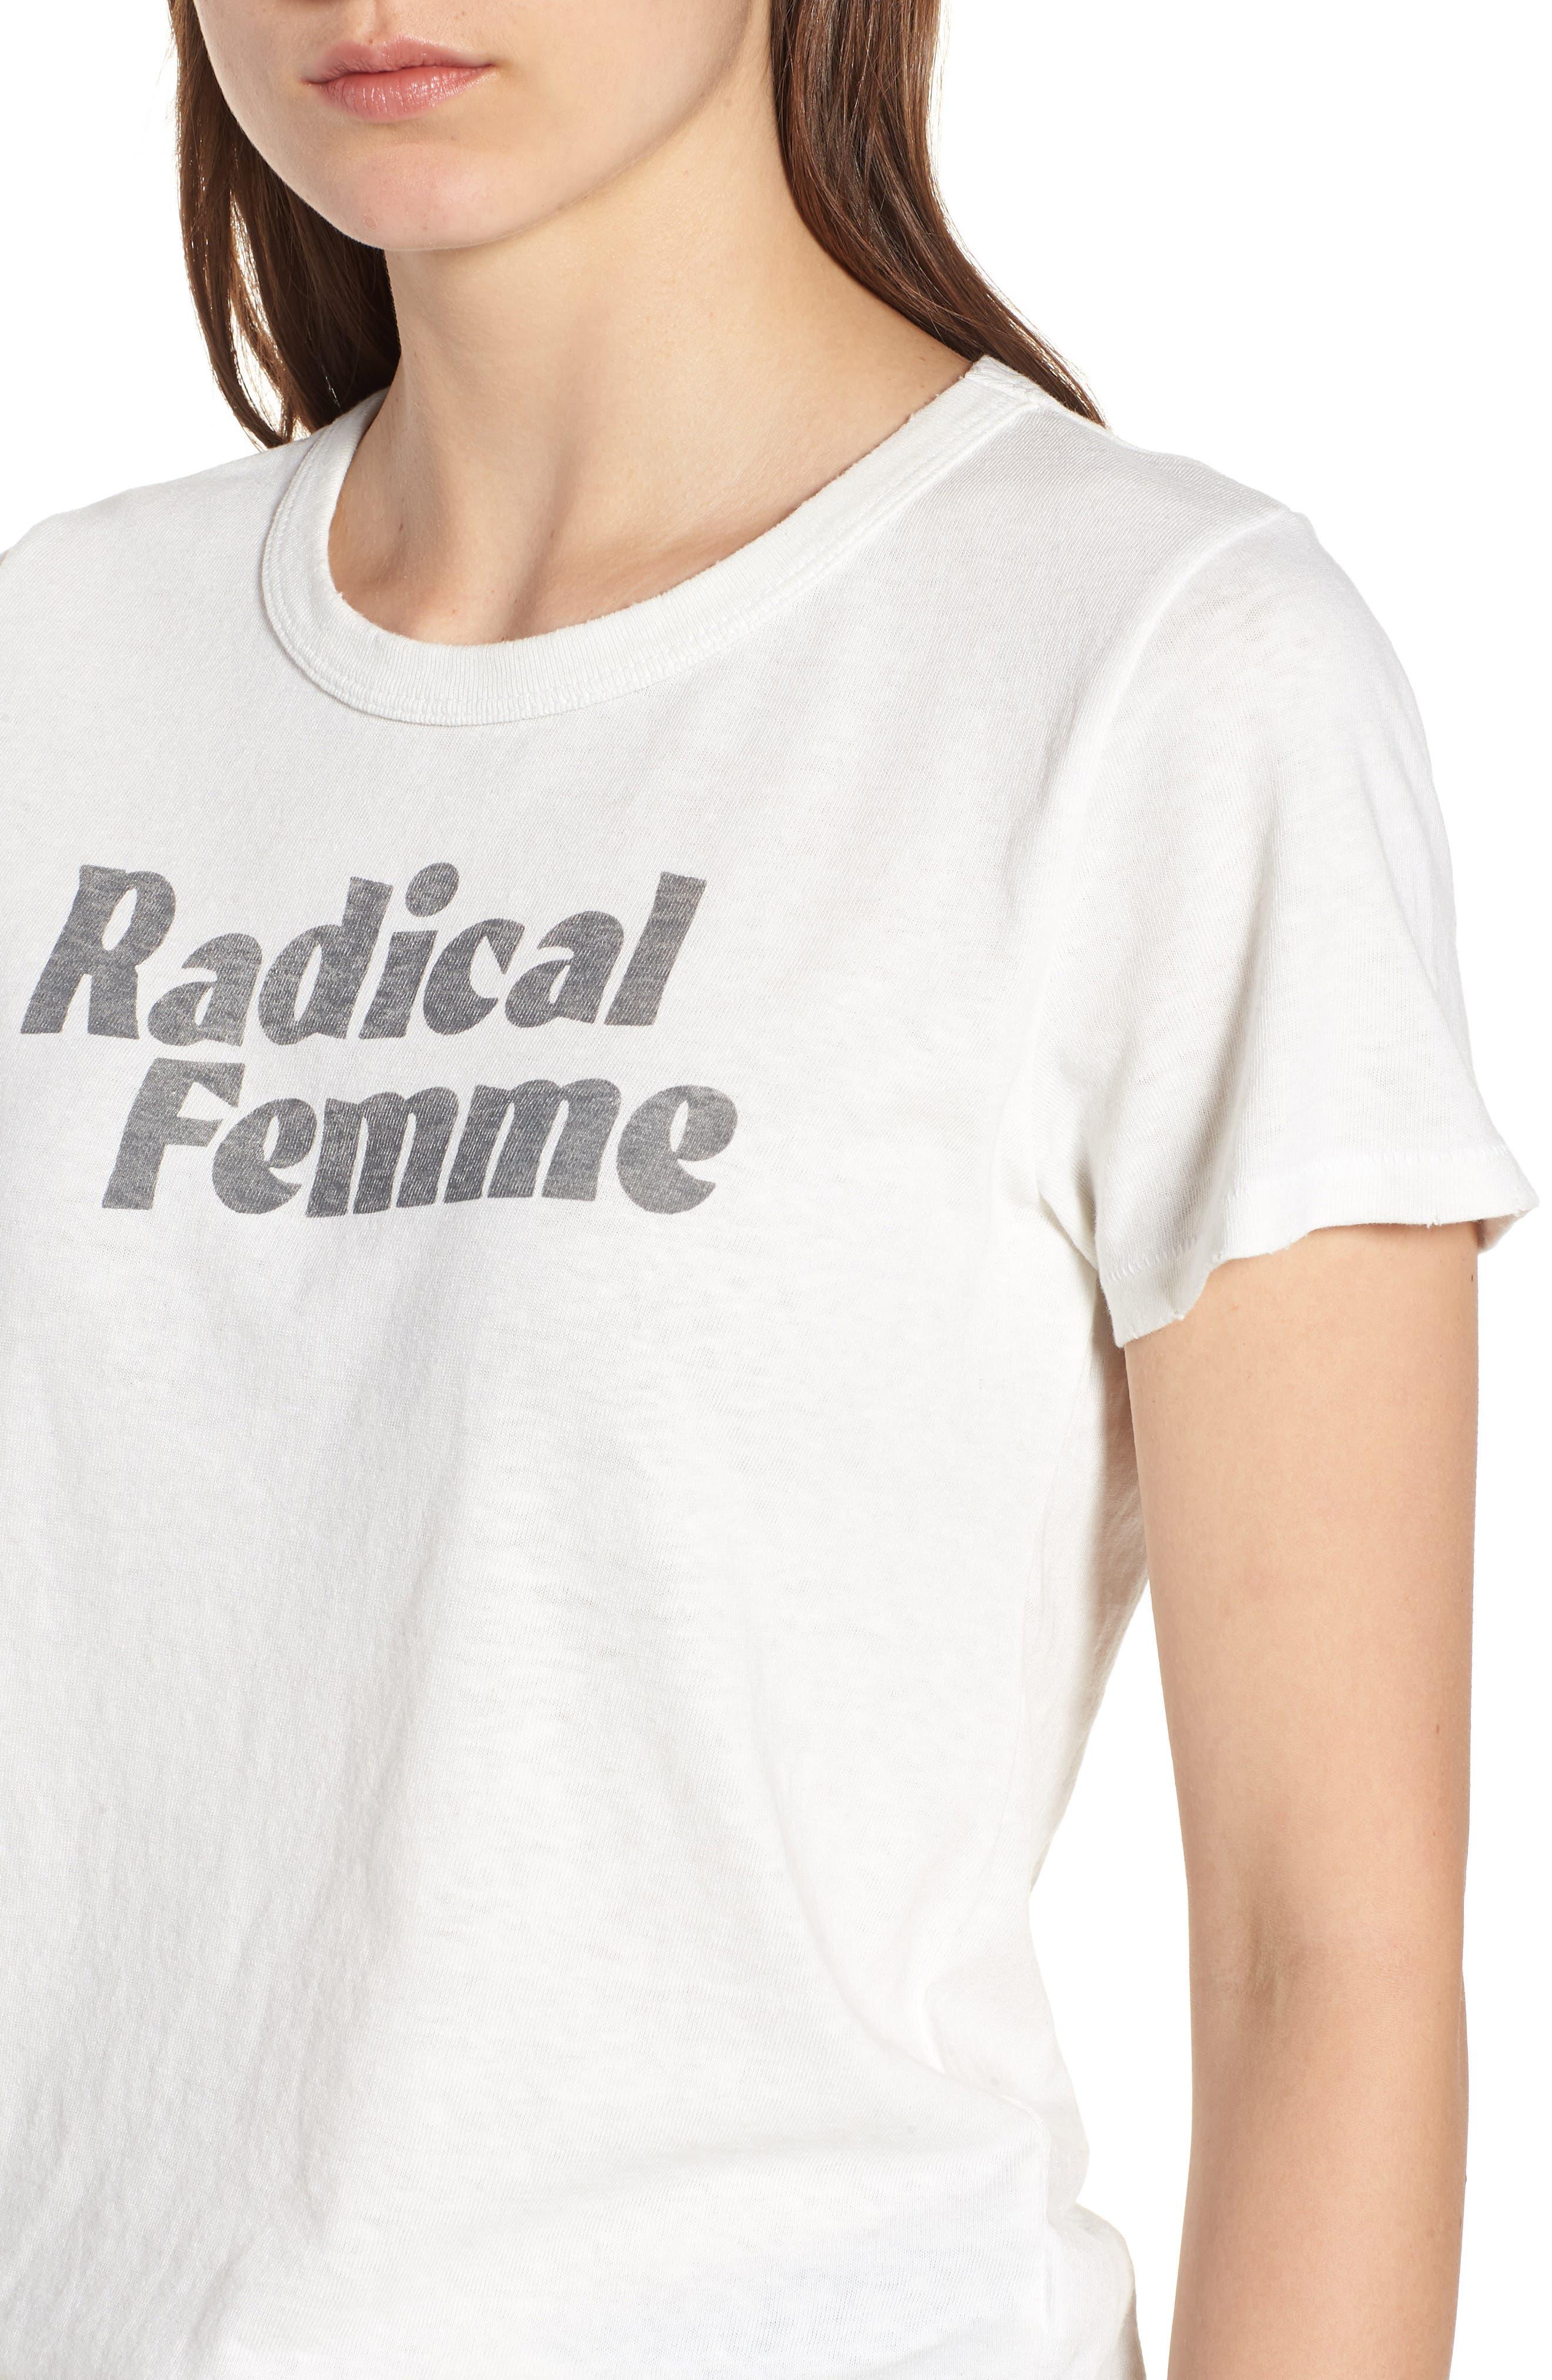 Radical Femme Tee,                             Alternate thumbnail 4, color,                             110